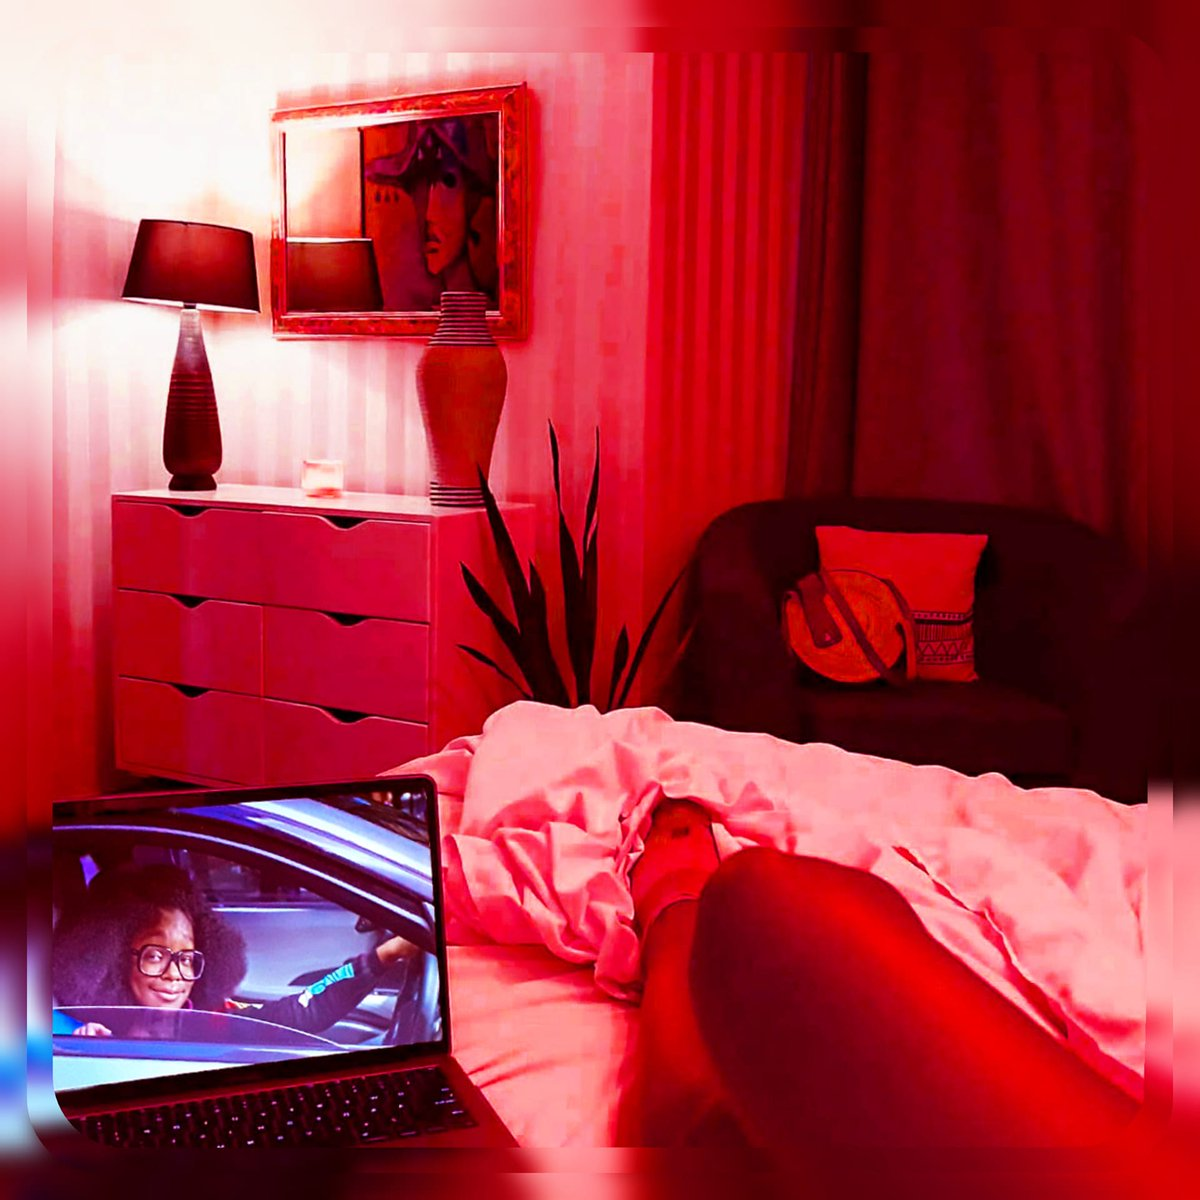 💻 Woi Insomnia 🙃 #late #night #movie #little #marsaimartin #phenomenon #young #blackgirl https://t.co/9V51U0fR3b